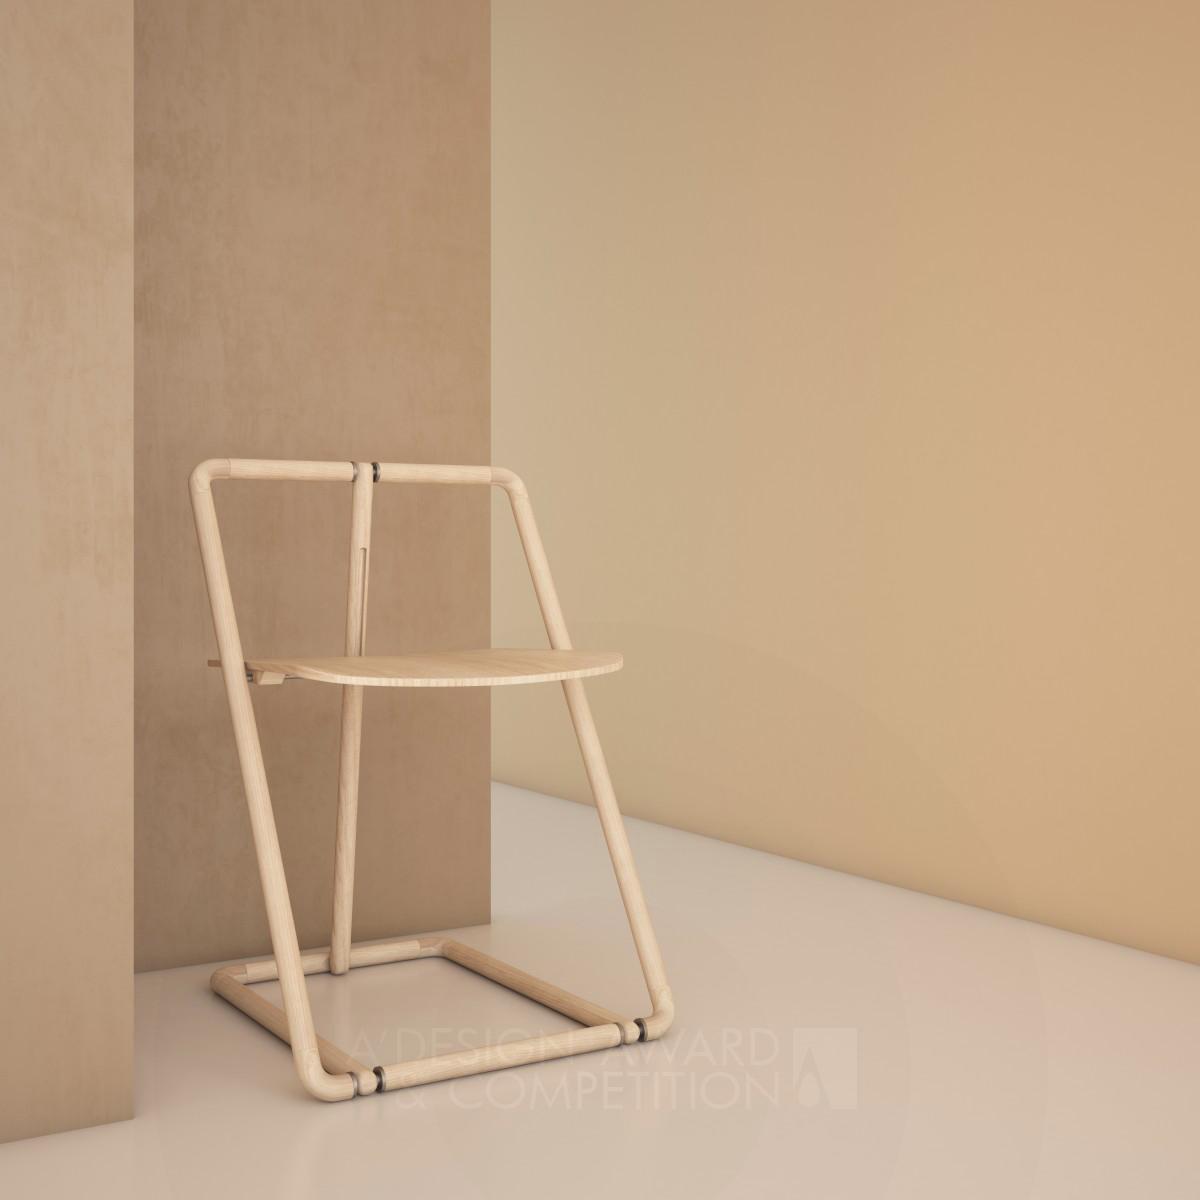 Flipp Folding Chair